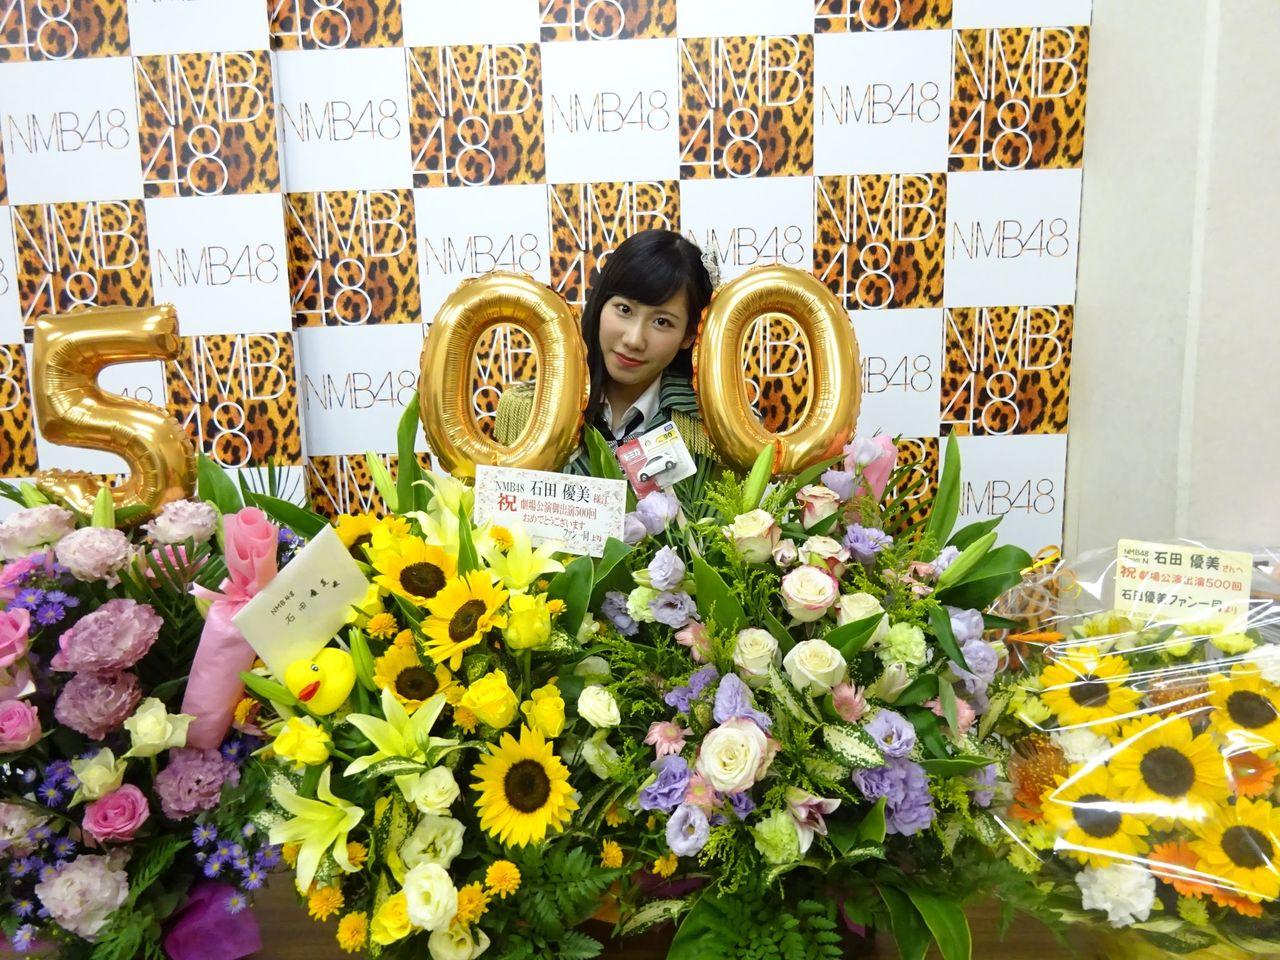 【NMB48】石田優美が500回公演、木下百花が300回公演を達成!石田は500回一番乗り